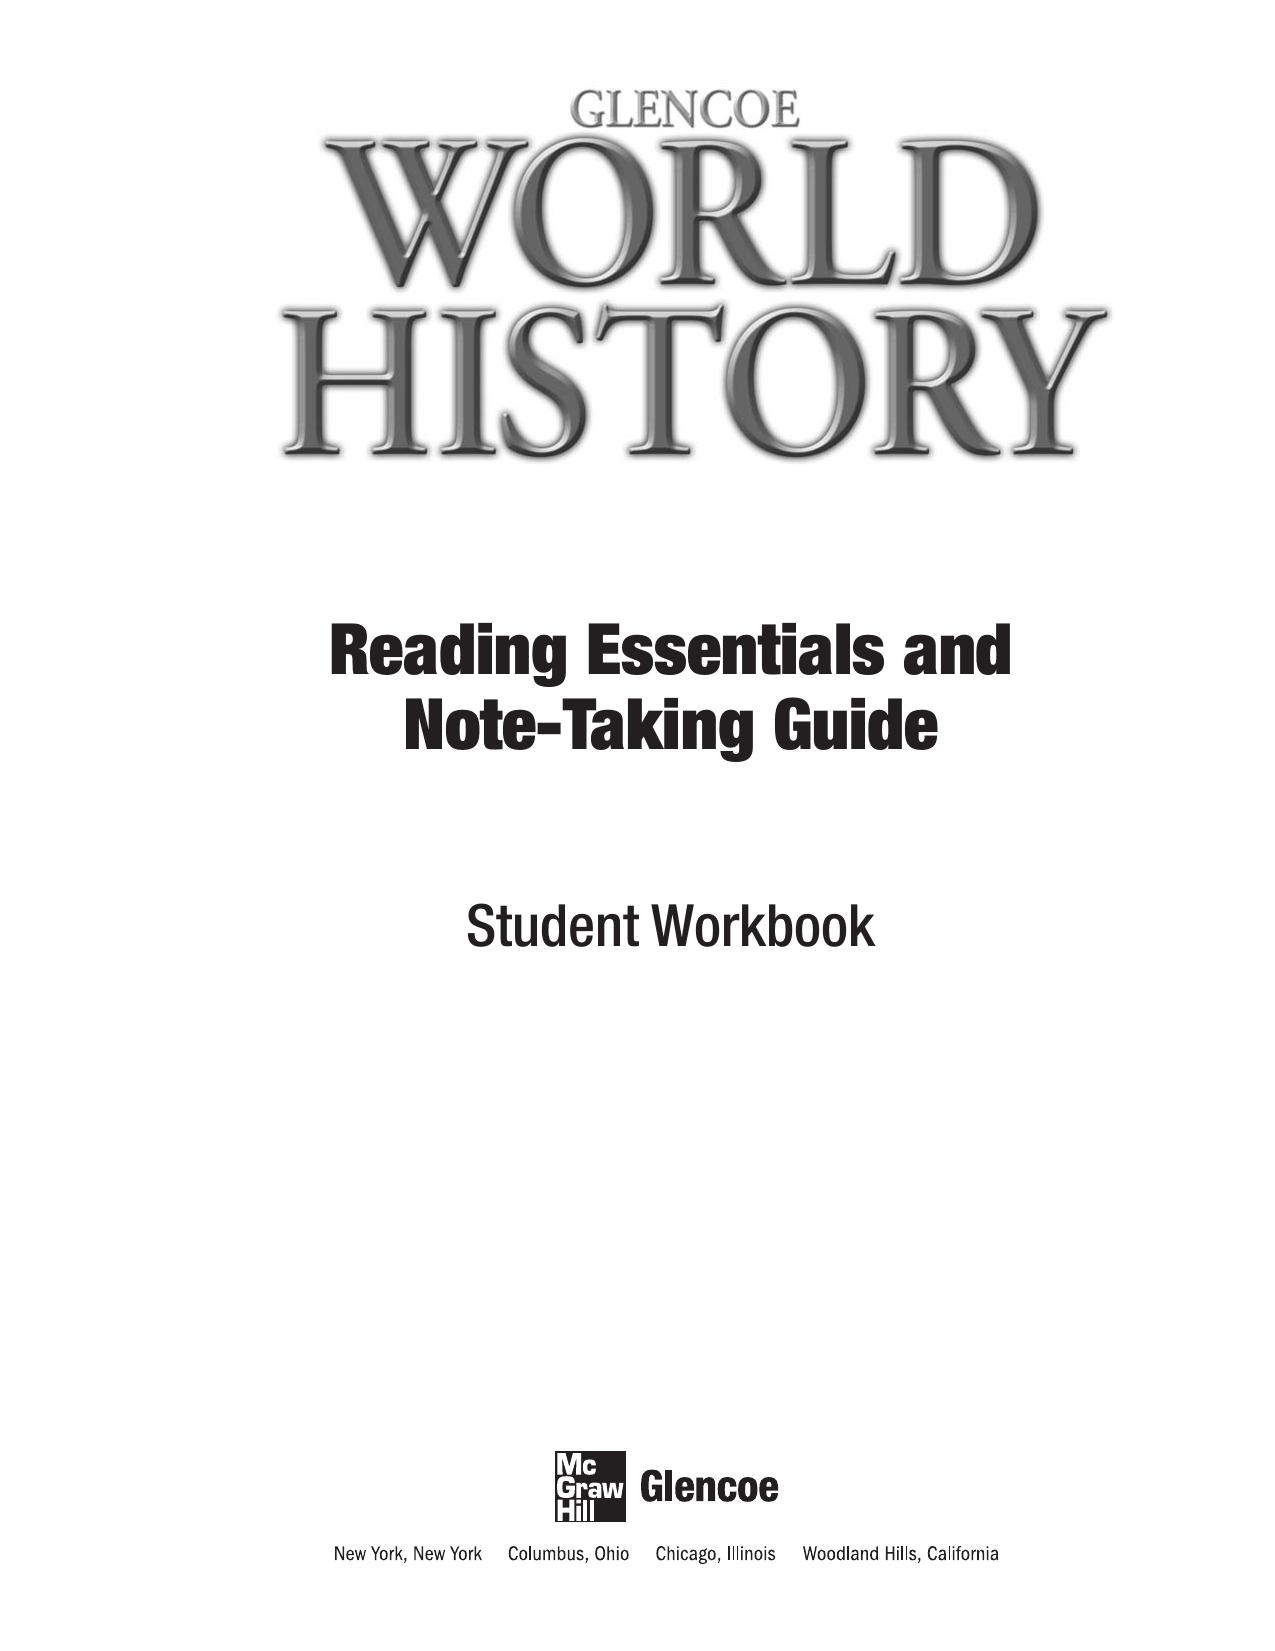 Gwhrentgse2World History Worksheets Regarding World History Worksheets